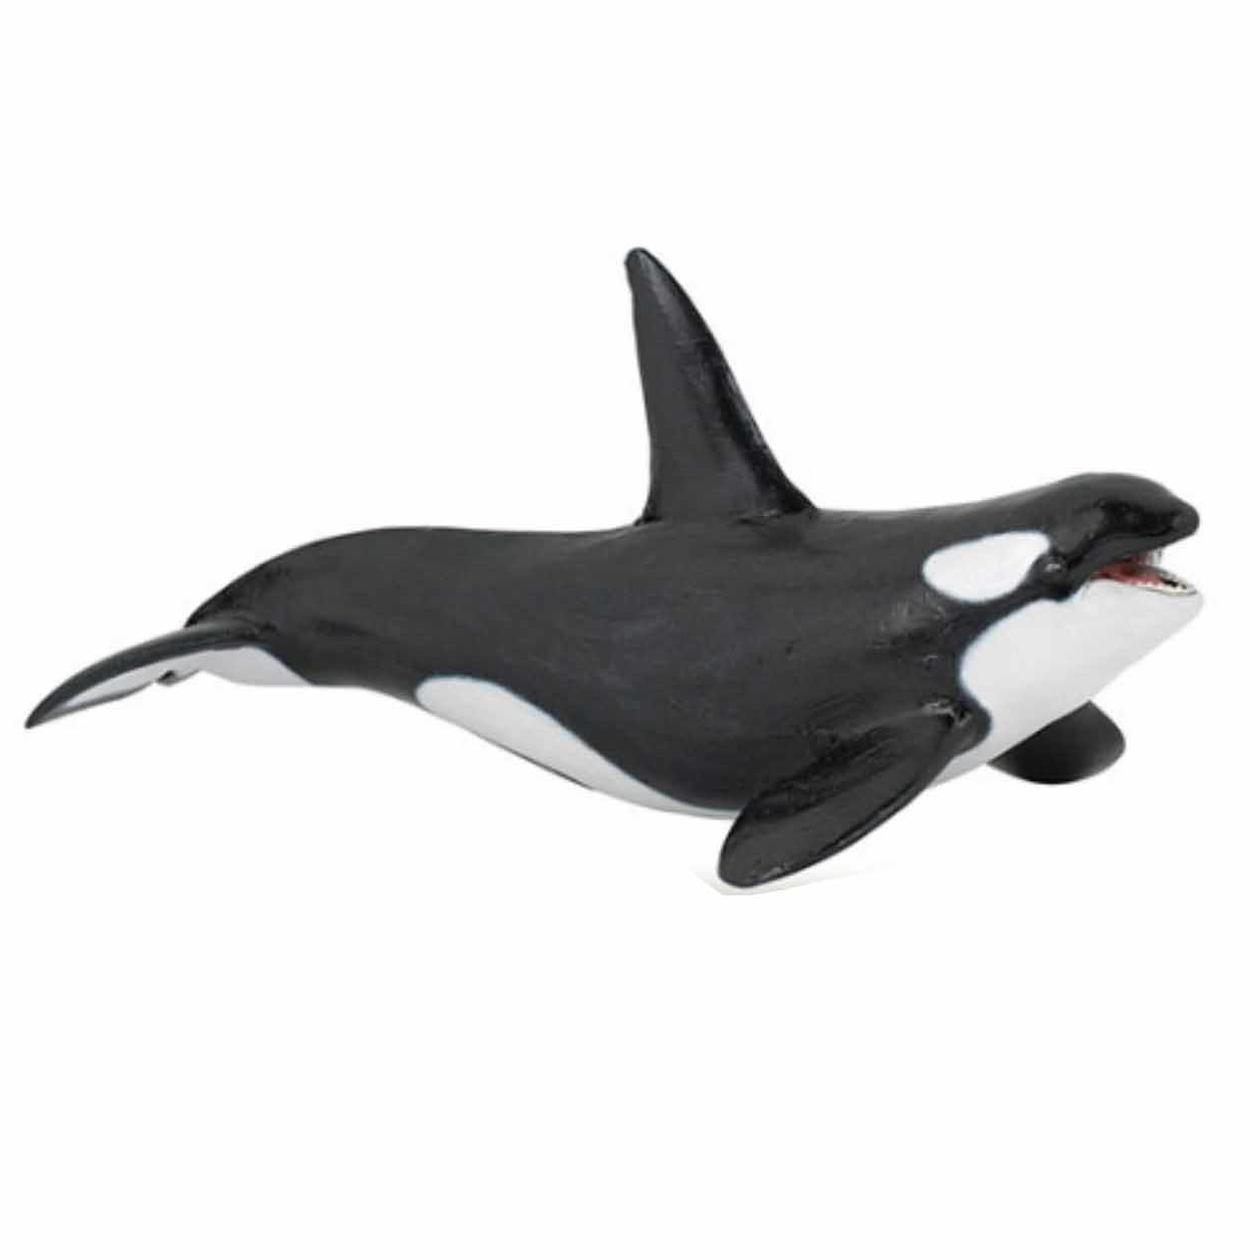 Plastic orka speeldiertje 18 cm